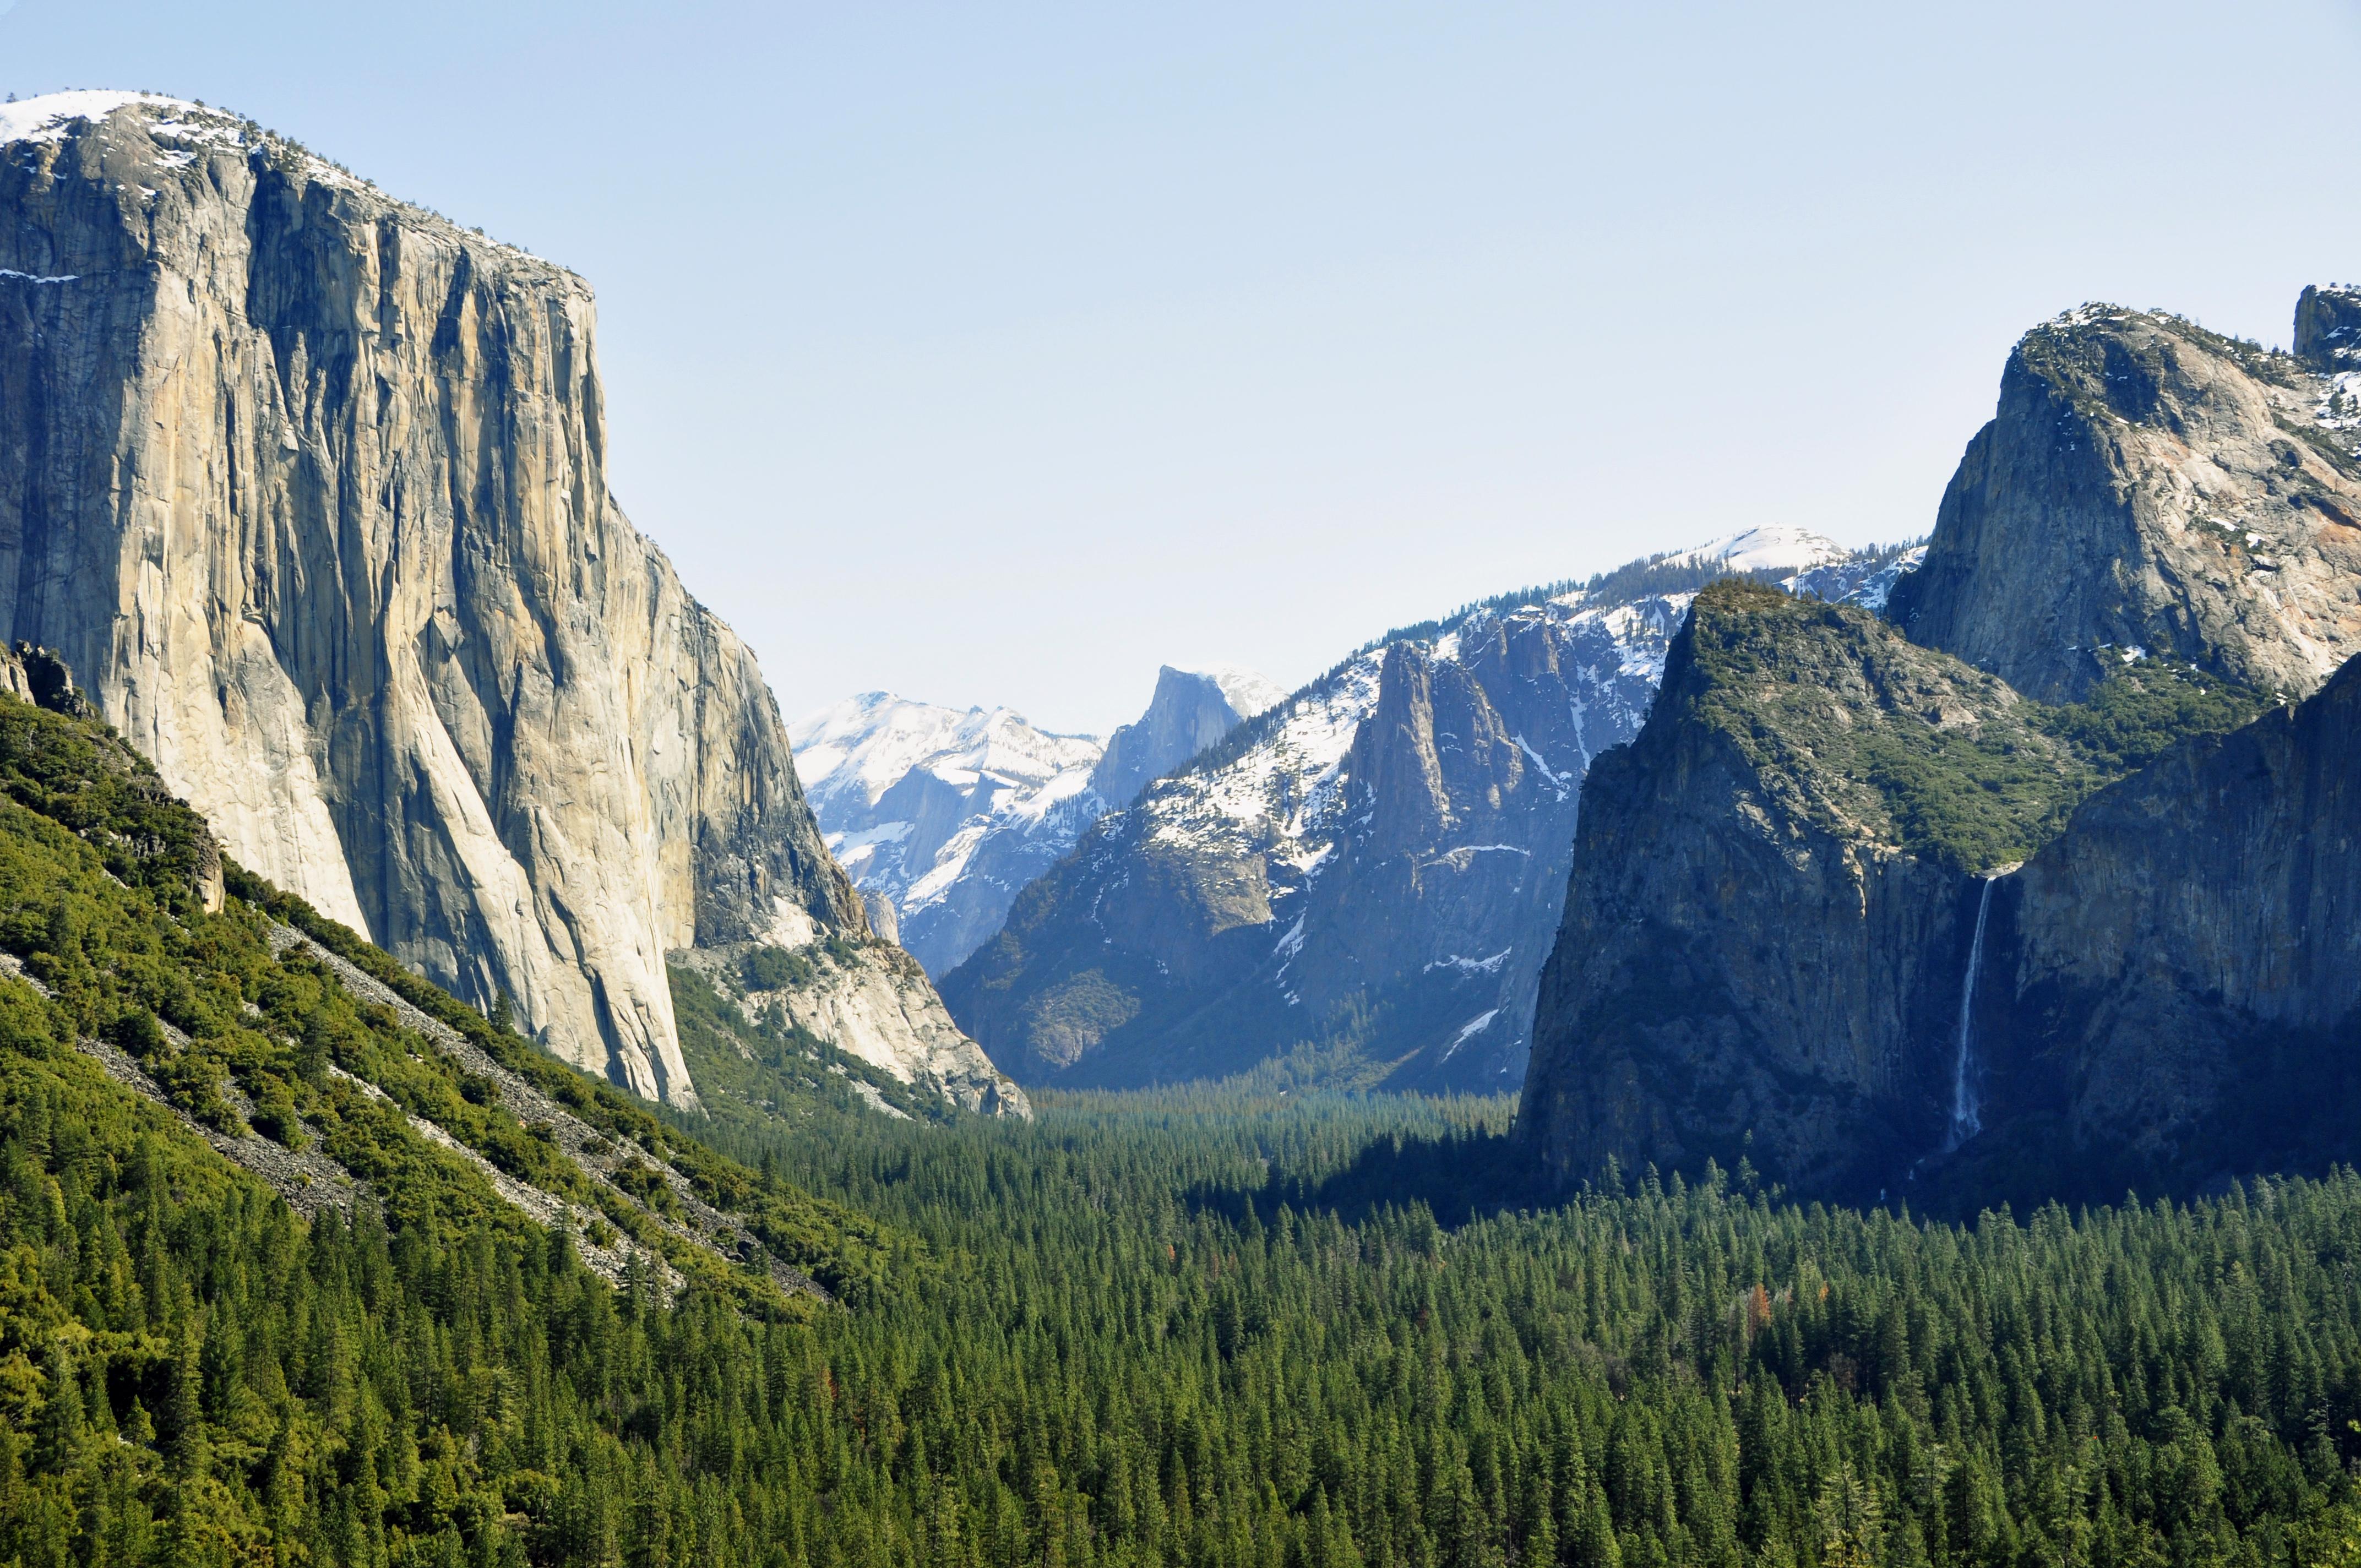 Other Yosemite Valleyedit Yosemite National Park